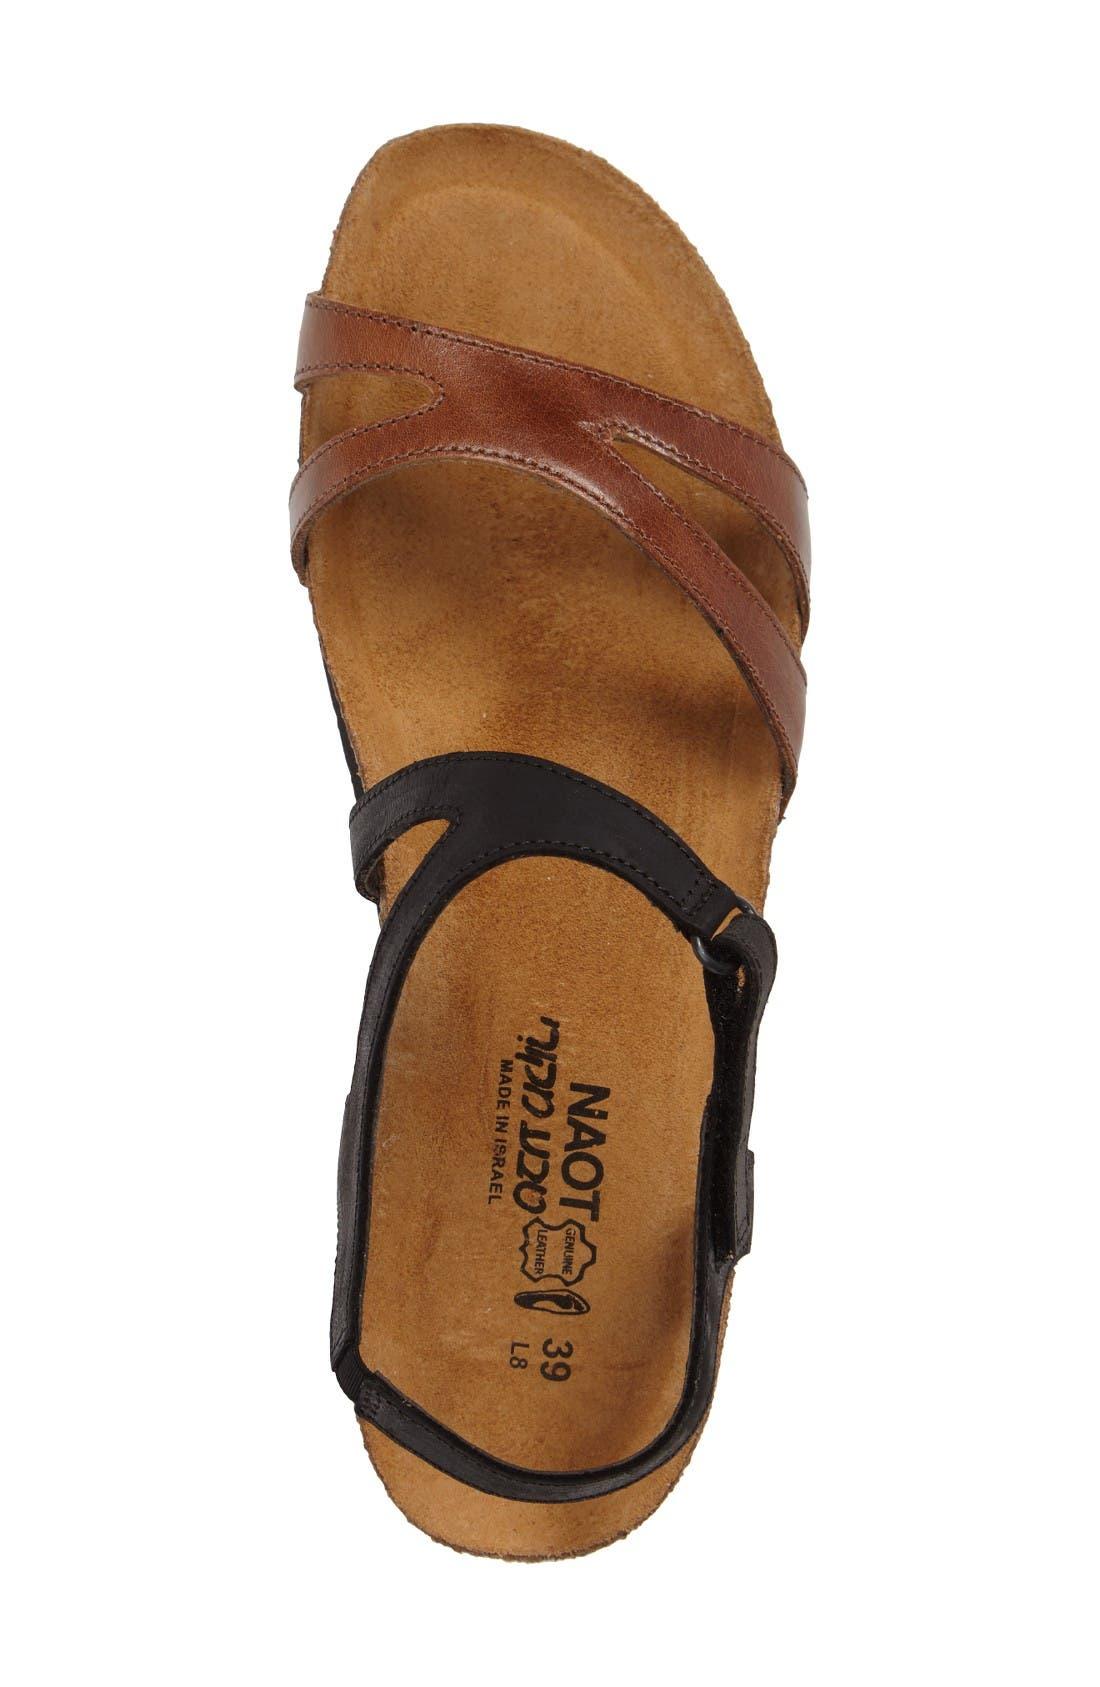 Janis Sandal,                             Alternate thumbnail 3, color,                             Brown/ Black Leather